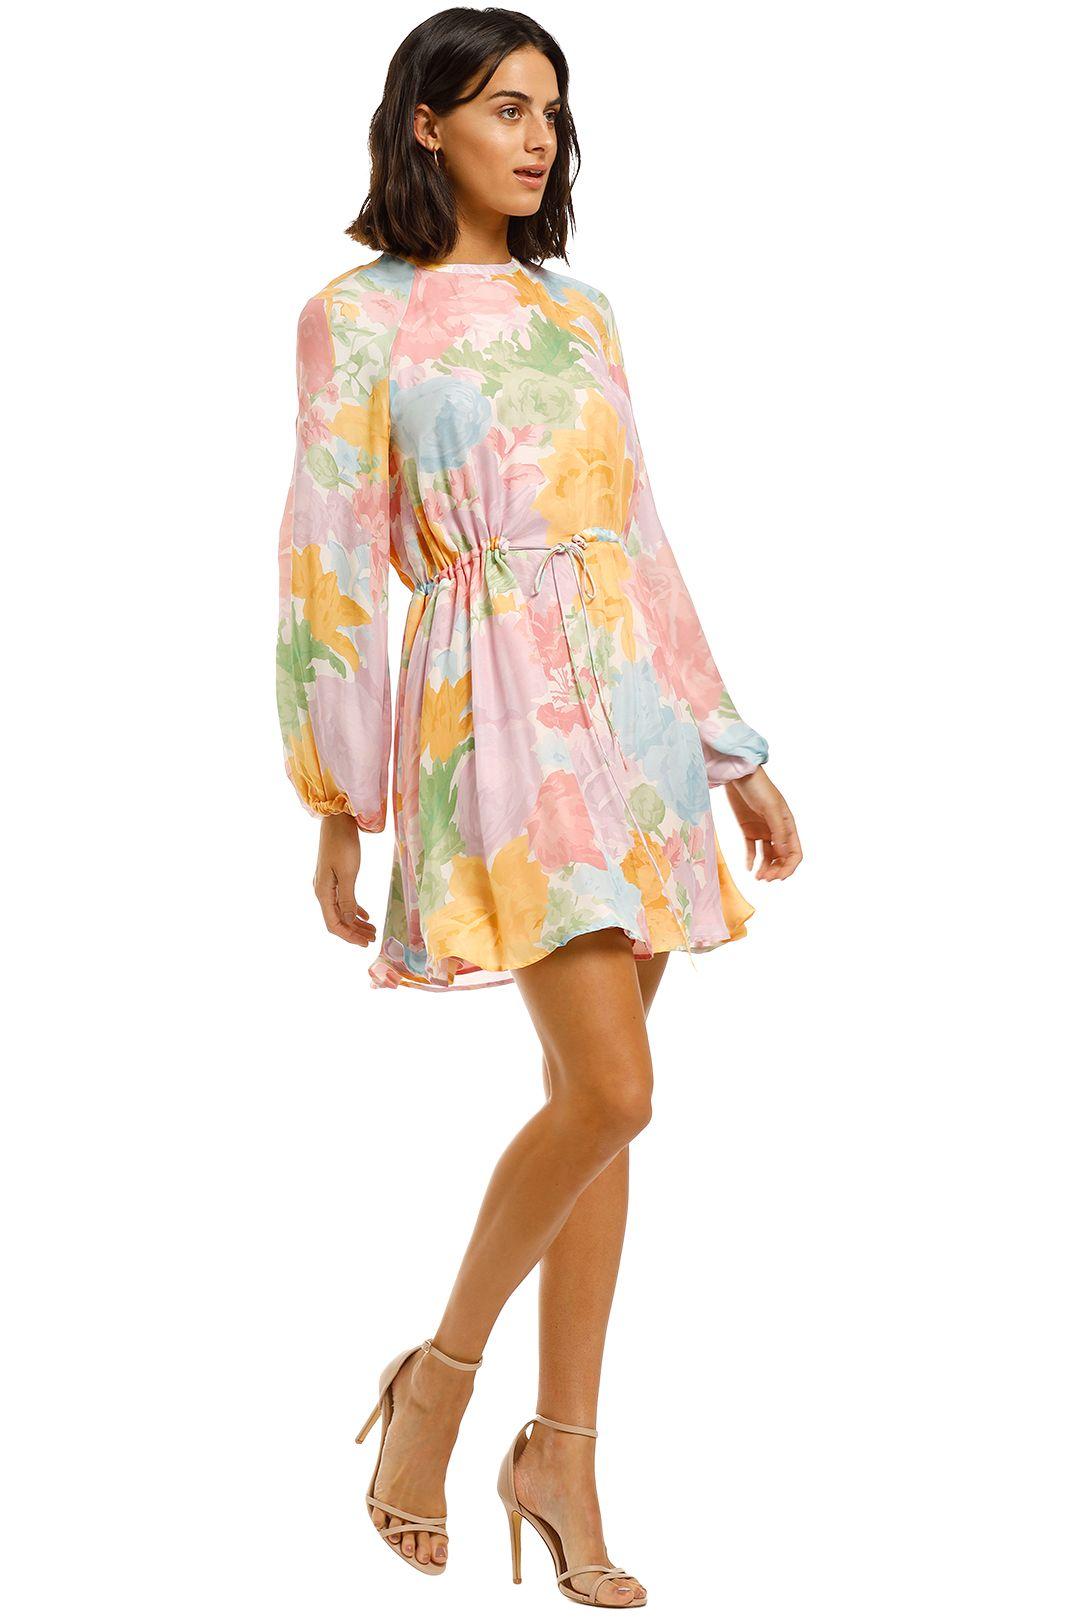 Stine-Goya-Coco-Dress-Rose-Garden-Pastel-Side